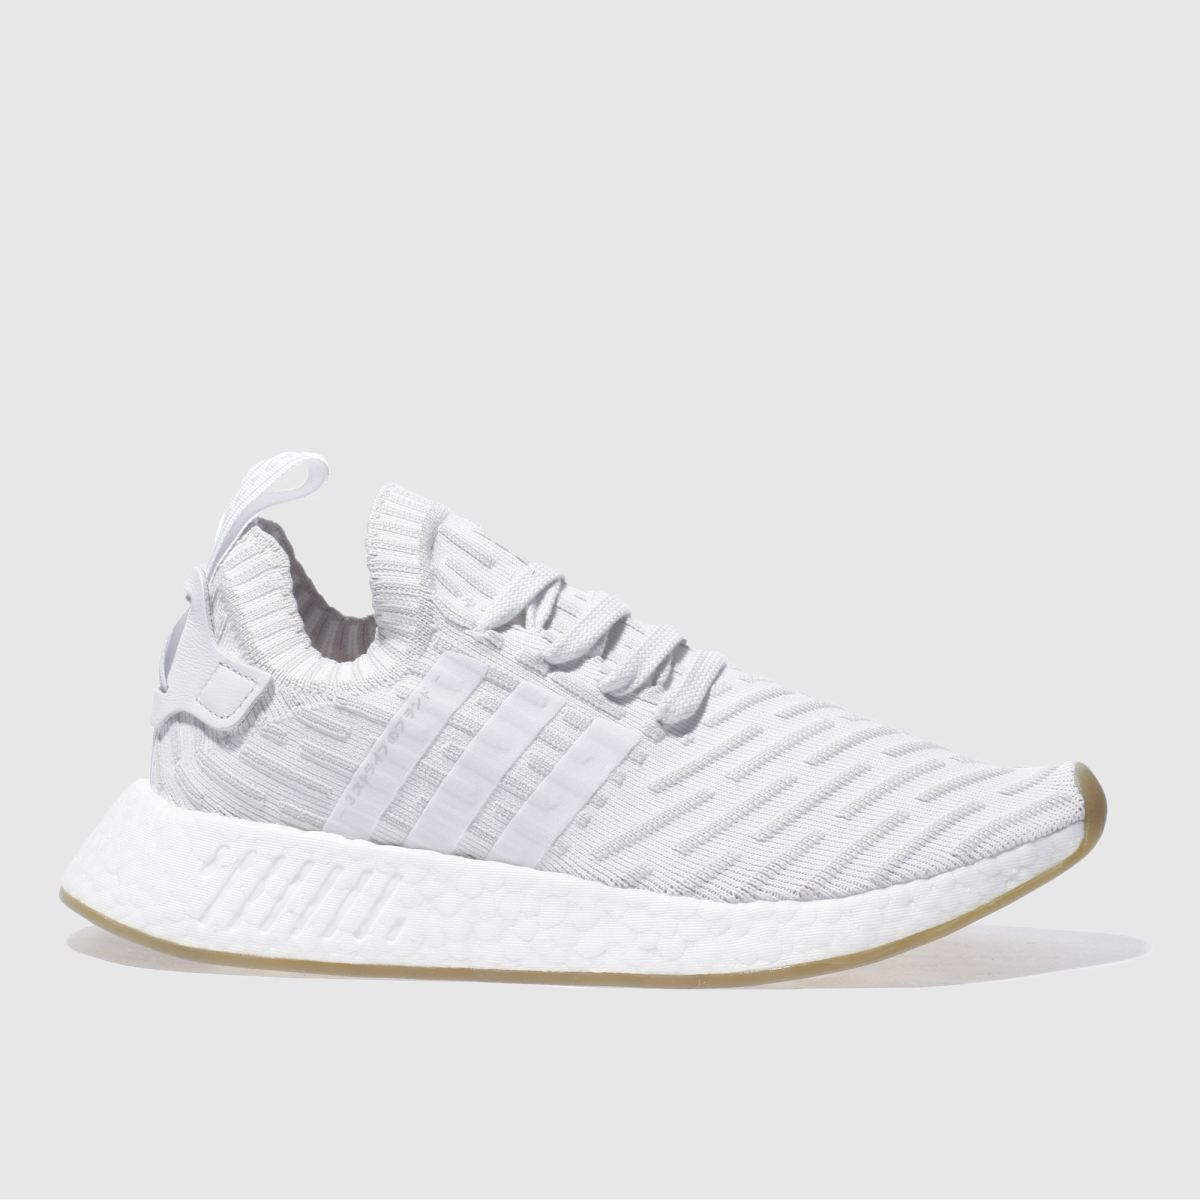 adidas white & grey nmd_r2 primeknit trainers